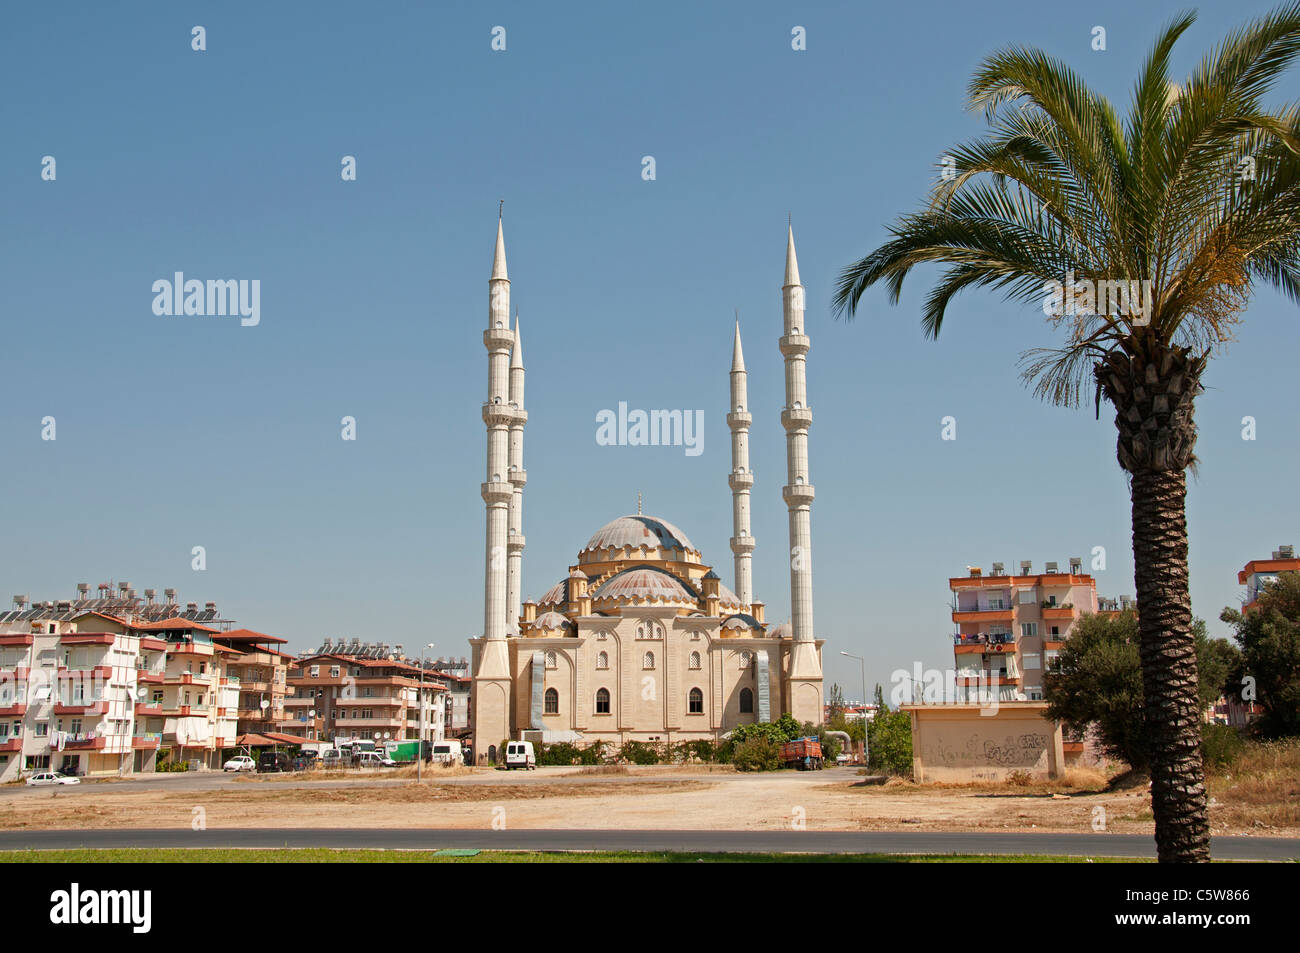 New Mosque near Alanya South Turkey Turkish - Stock Image